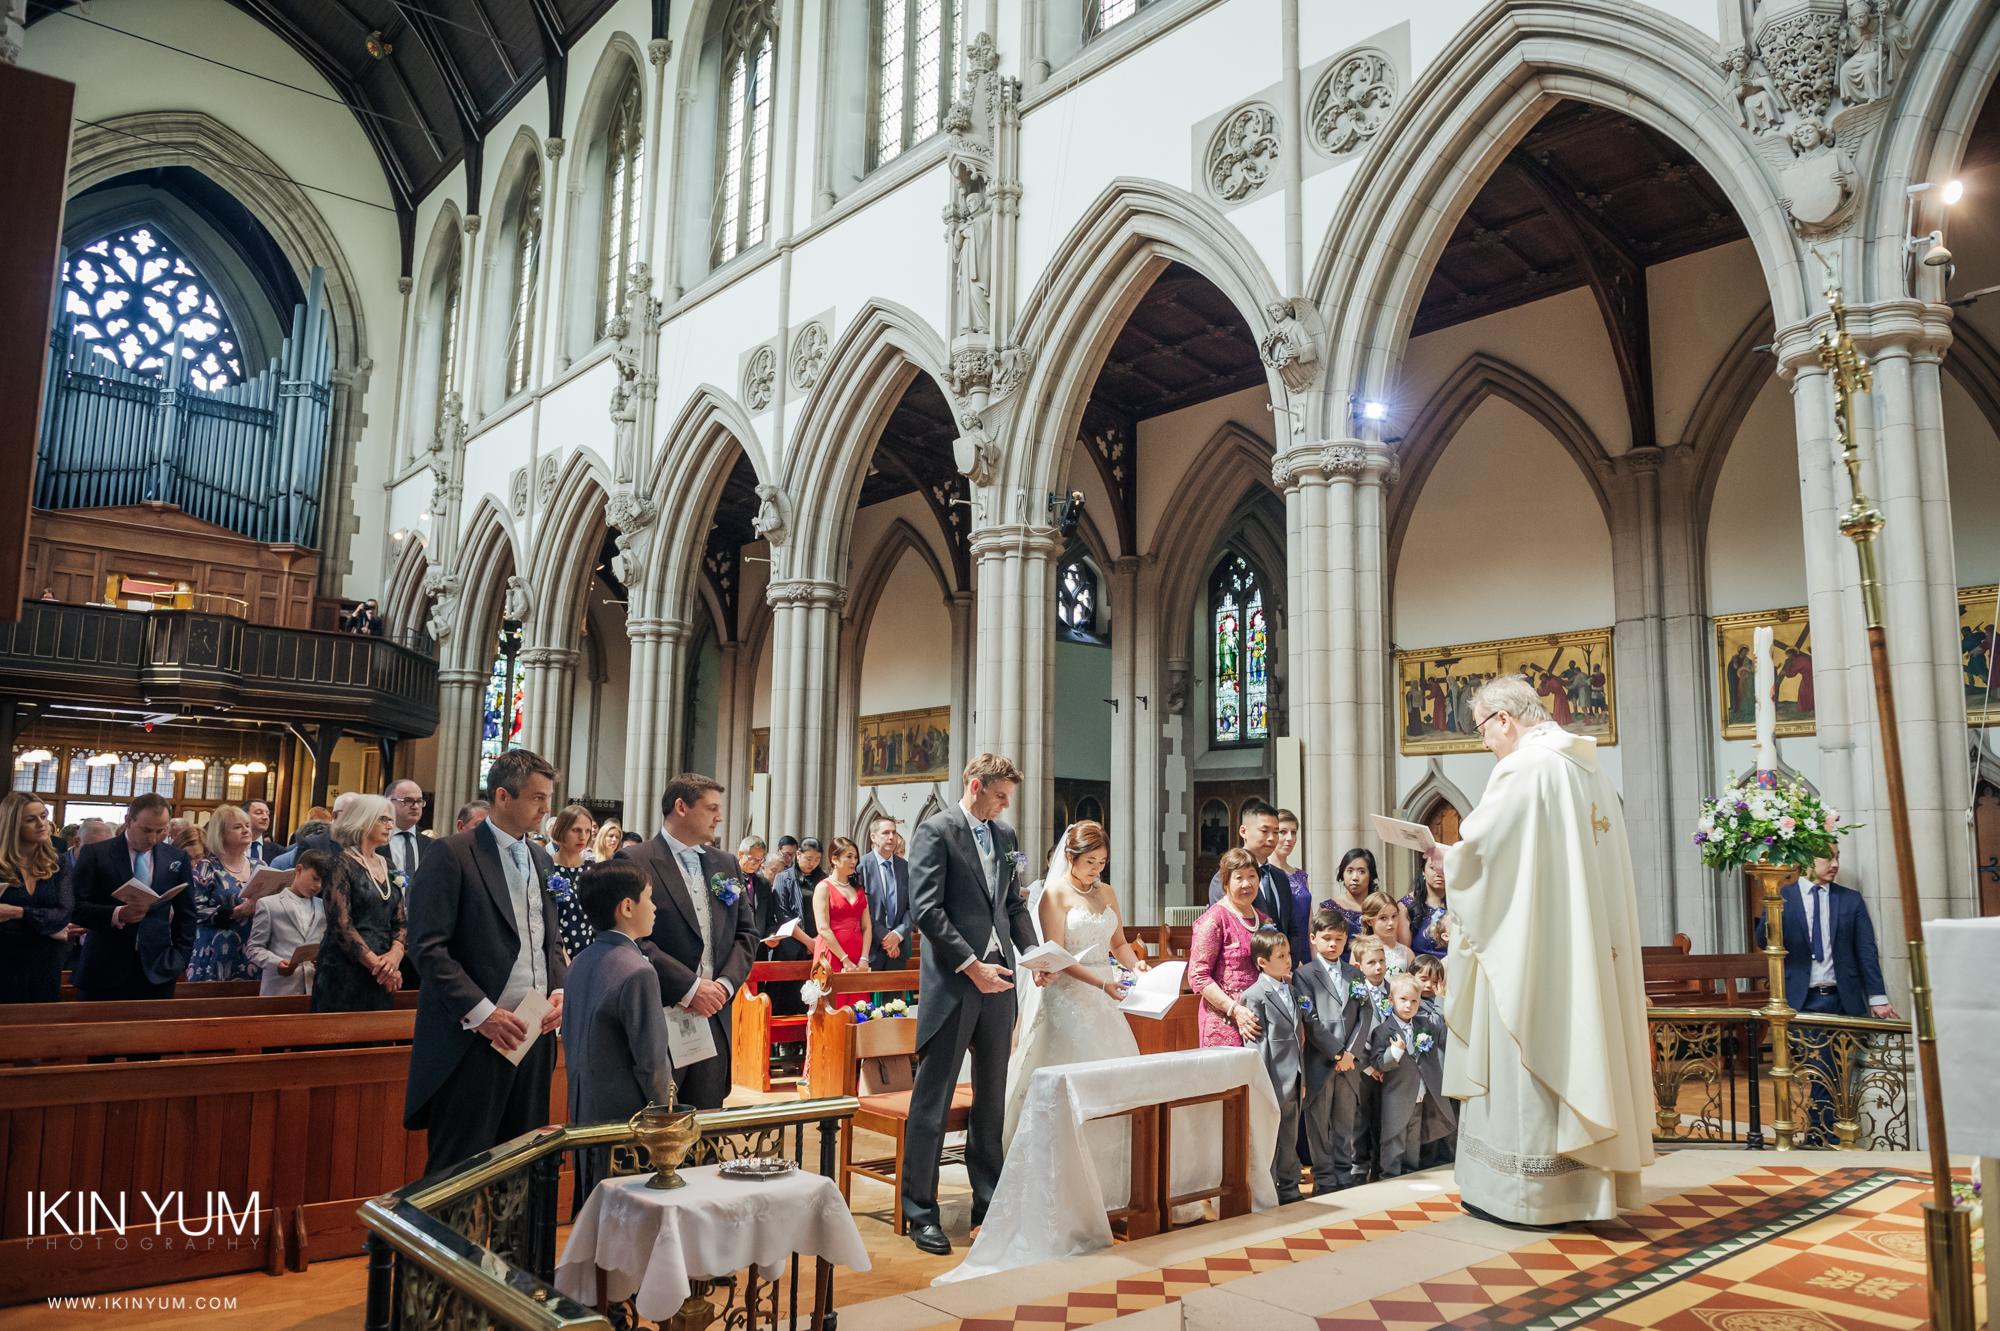 Teresa & Johnathan Weddong Day - The Ceremony-0069.jpg